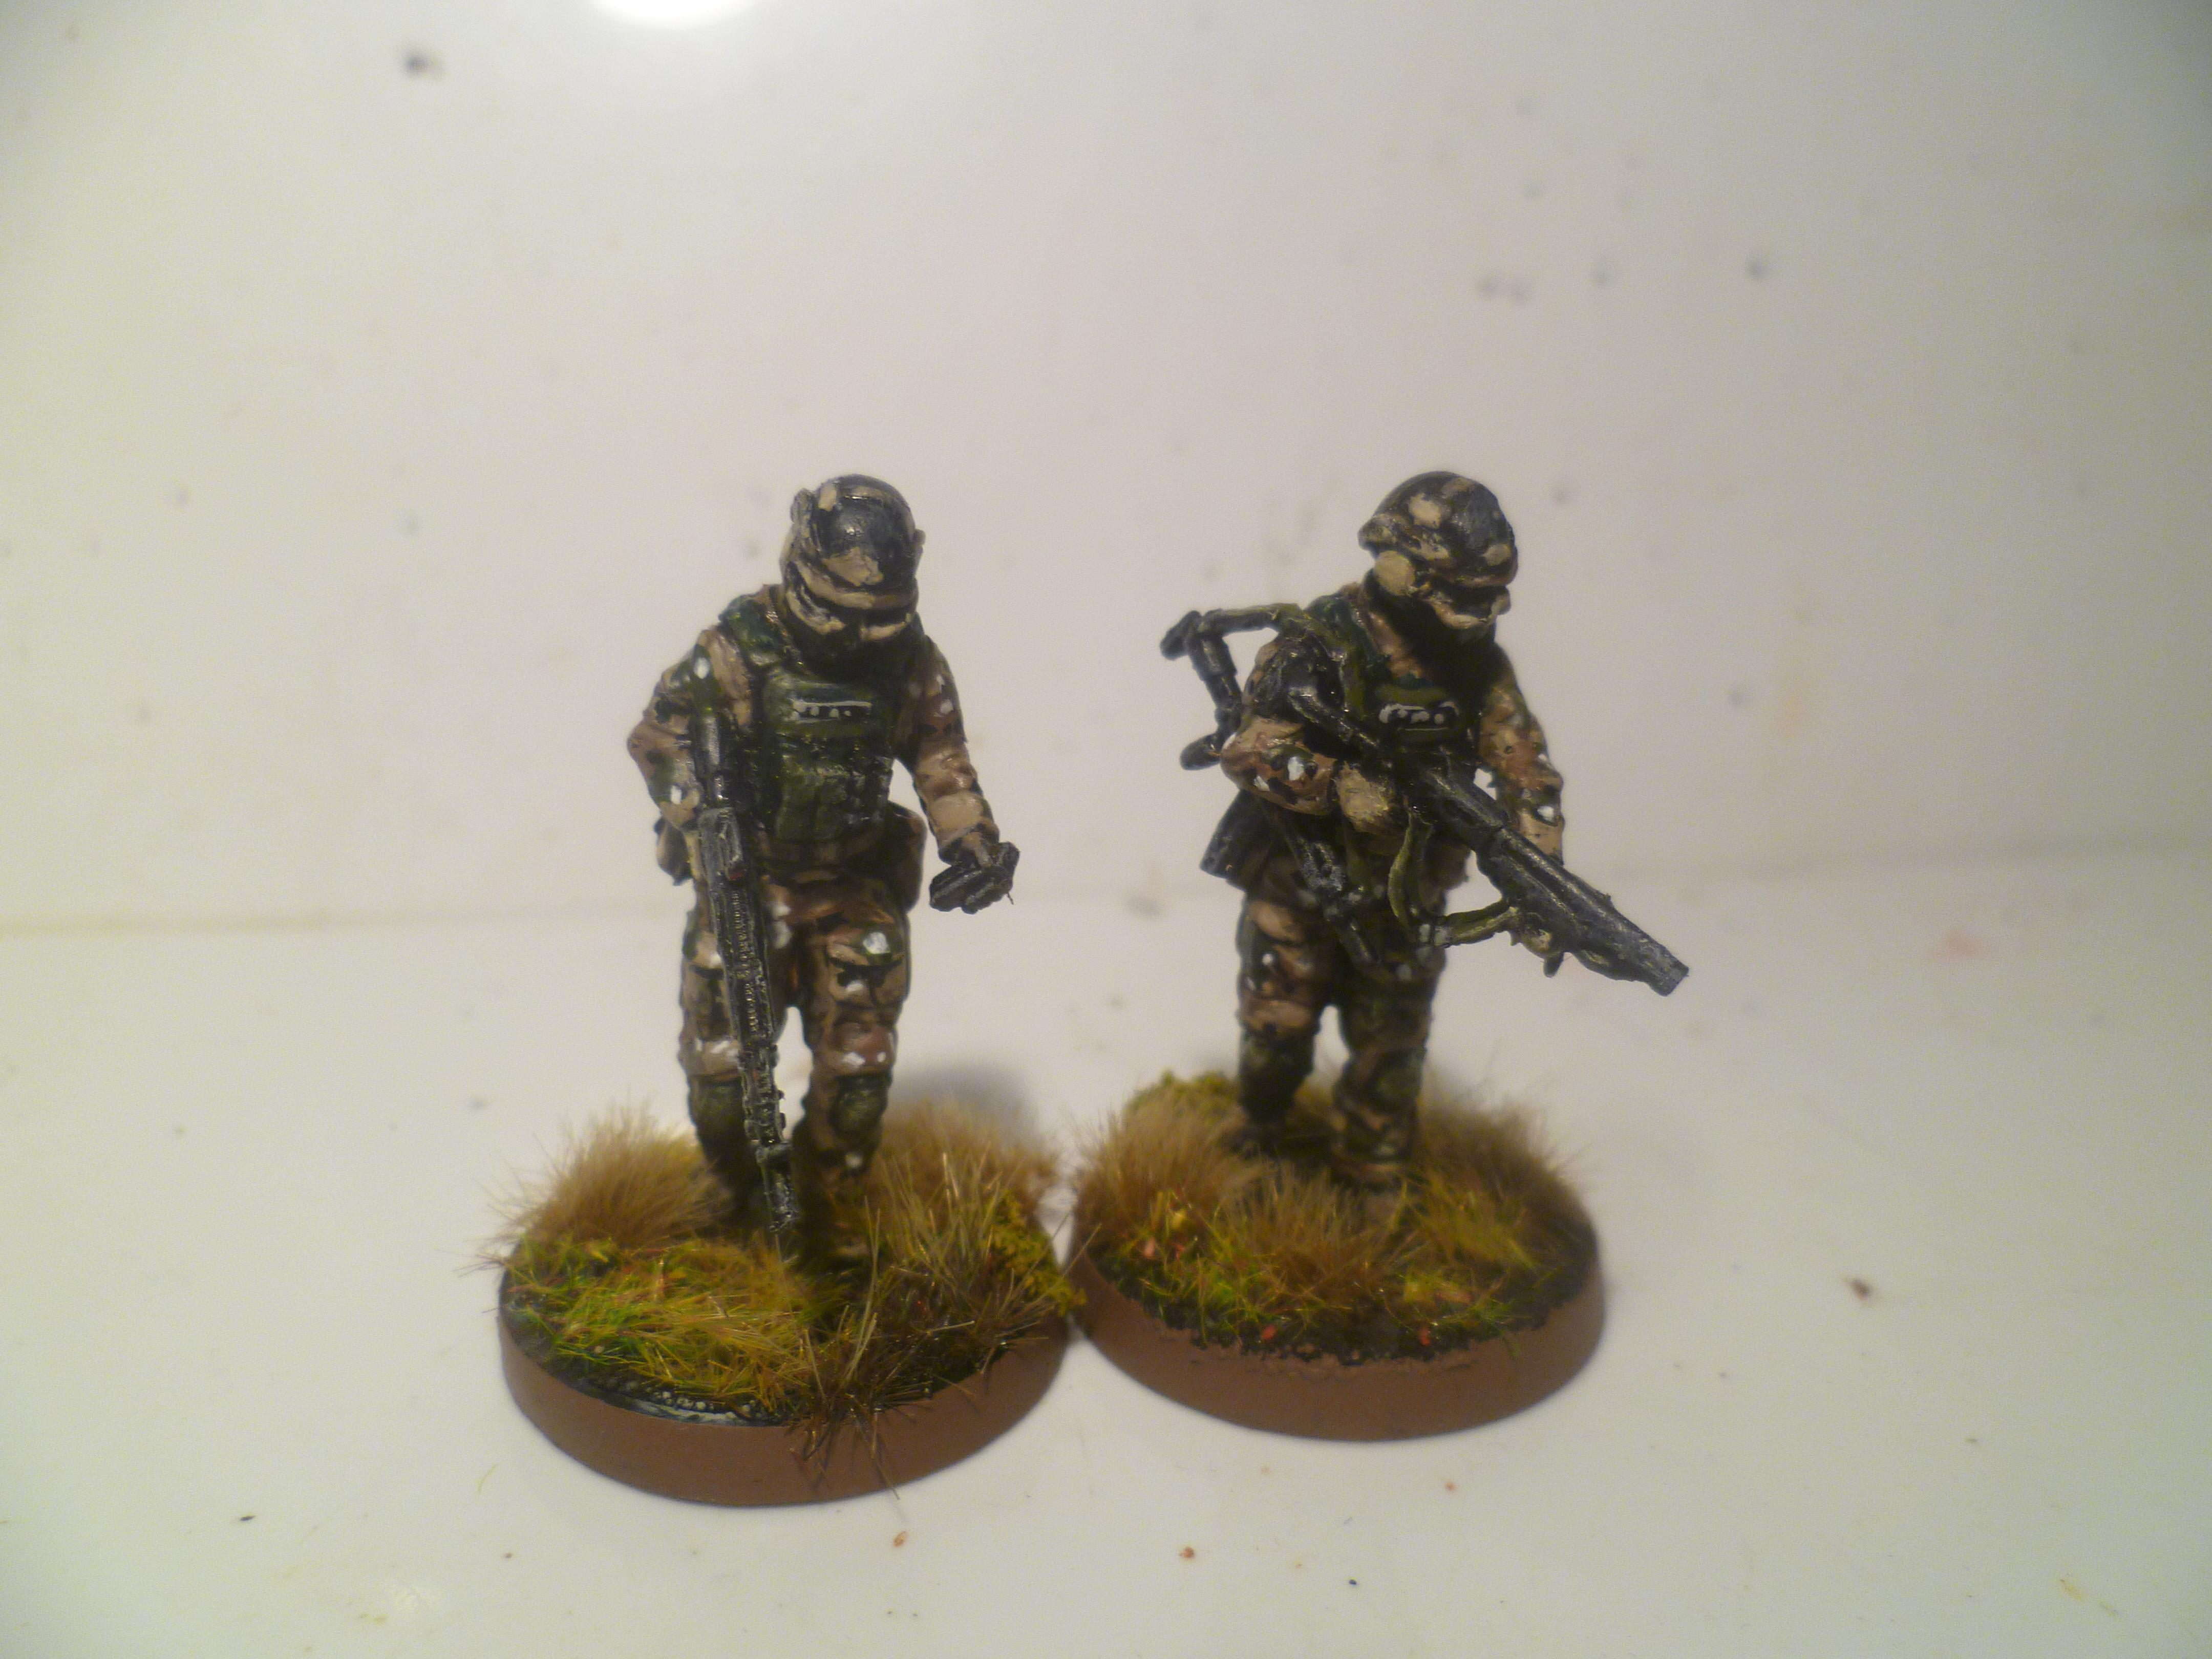 28mm, Camouflage, Conversion, Eastern European, European, Modern, Russians, Special Forces, Spetsnaz, Ukrainian